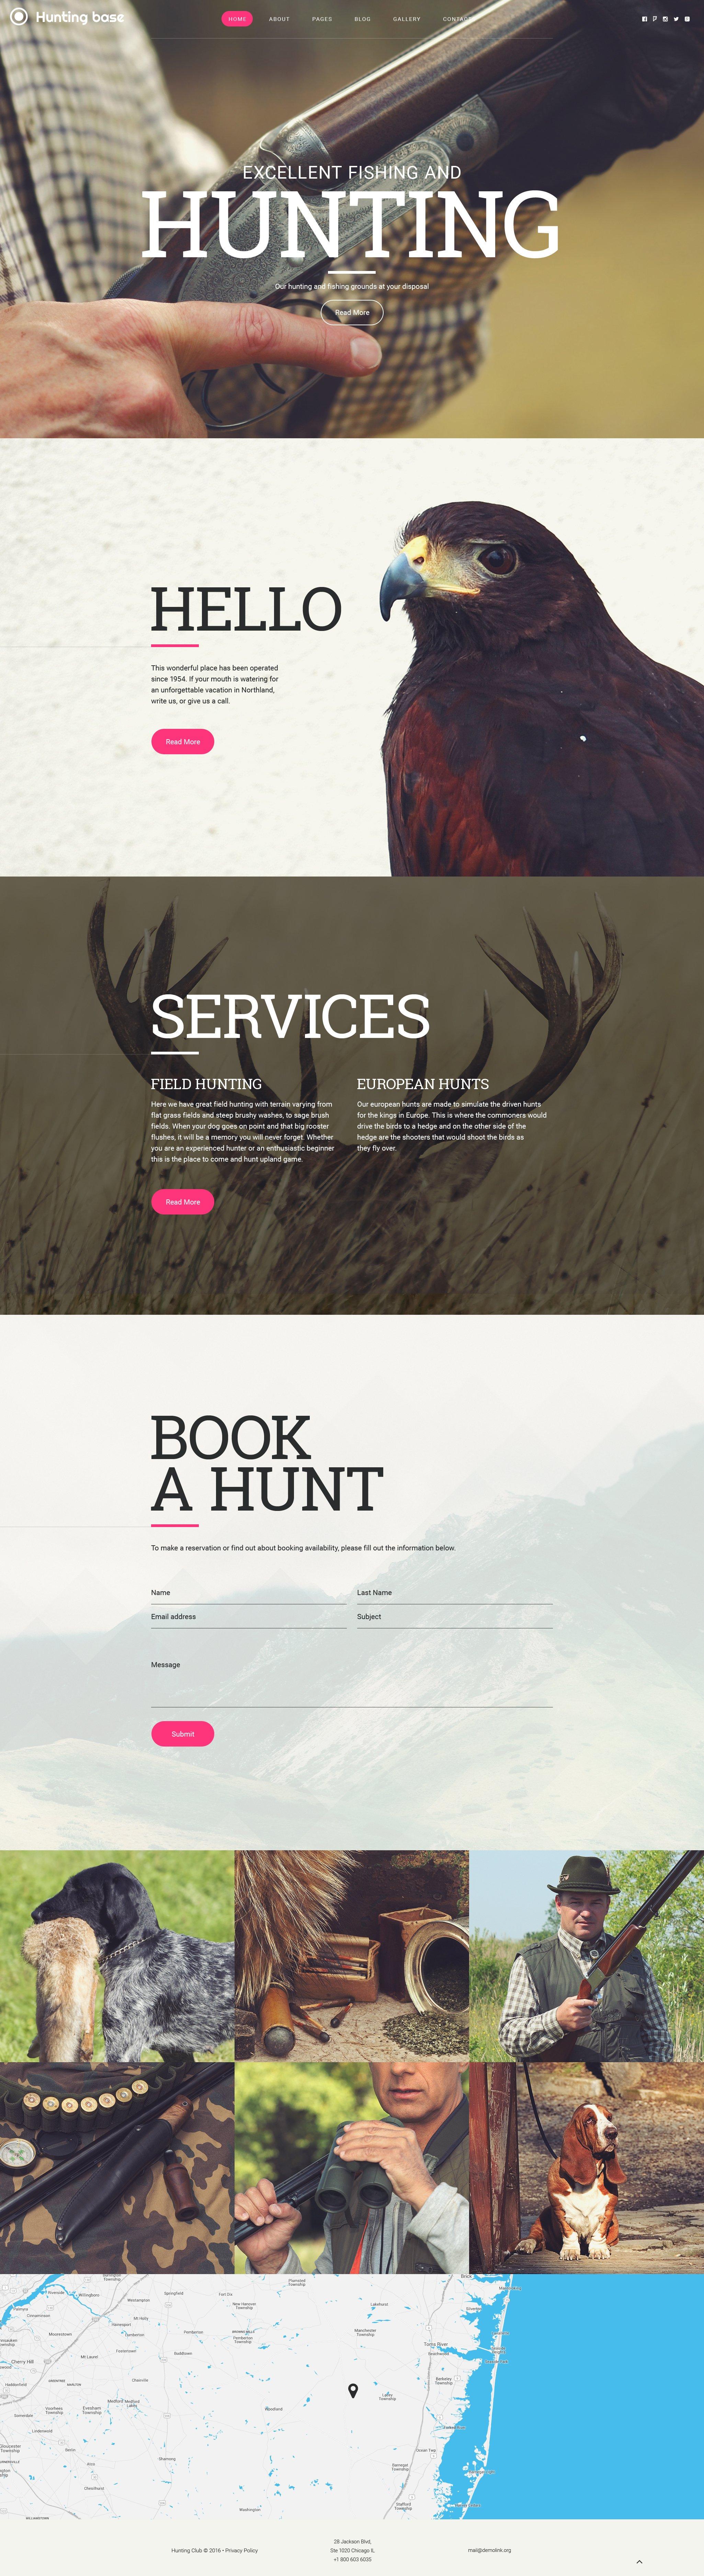 Hunting Joomla Theme